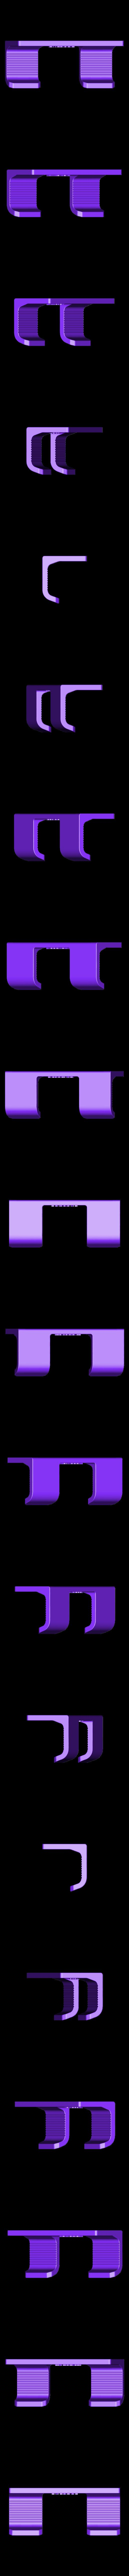 enforce_300_screws.stl Download free STL file Engineers Hammer Holder 300g 028 I for screws or peg board • Model to 3D print, Wiesemann1893